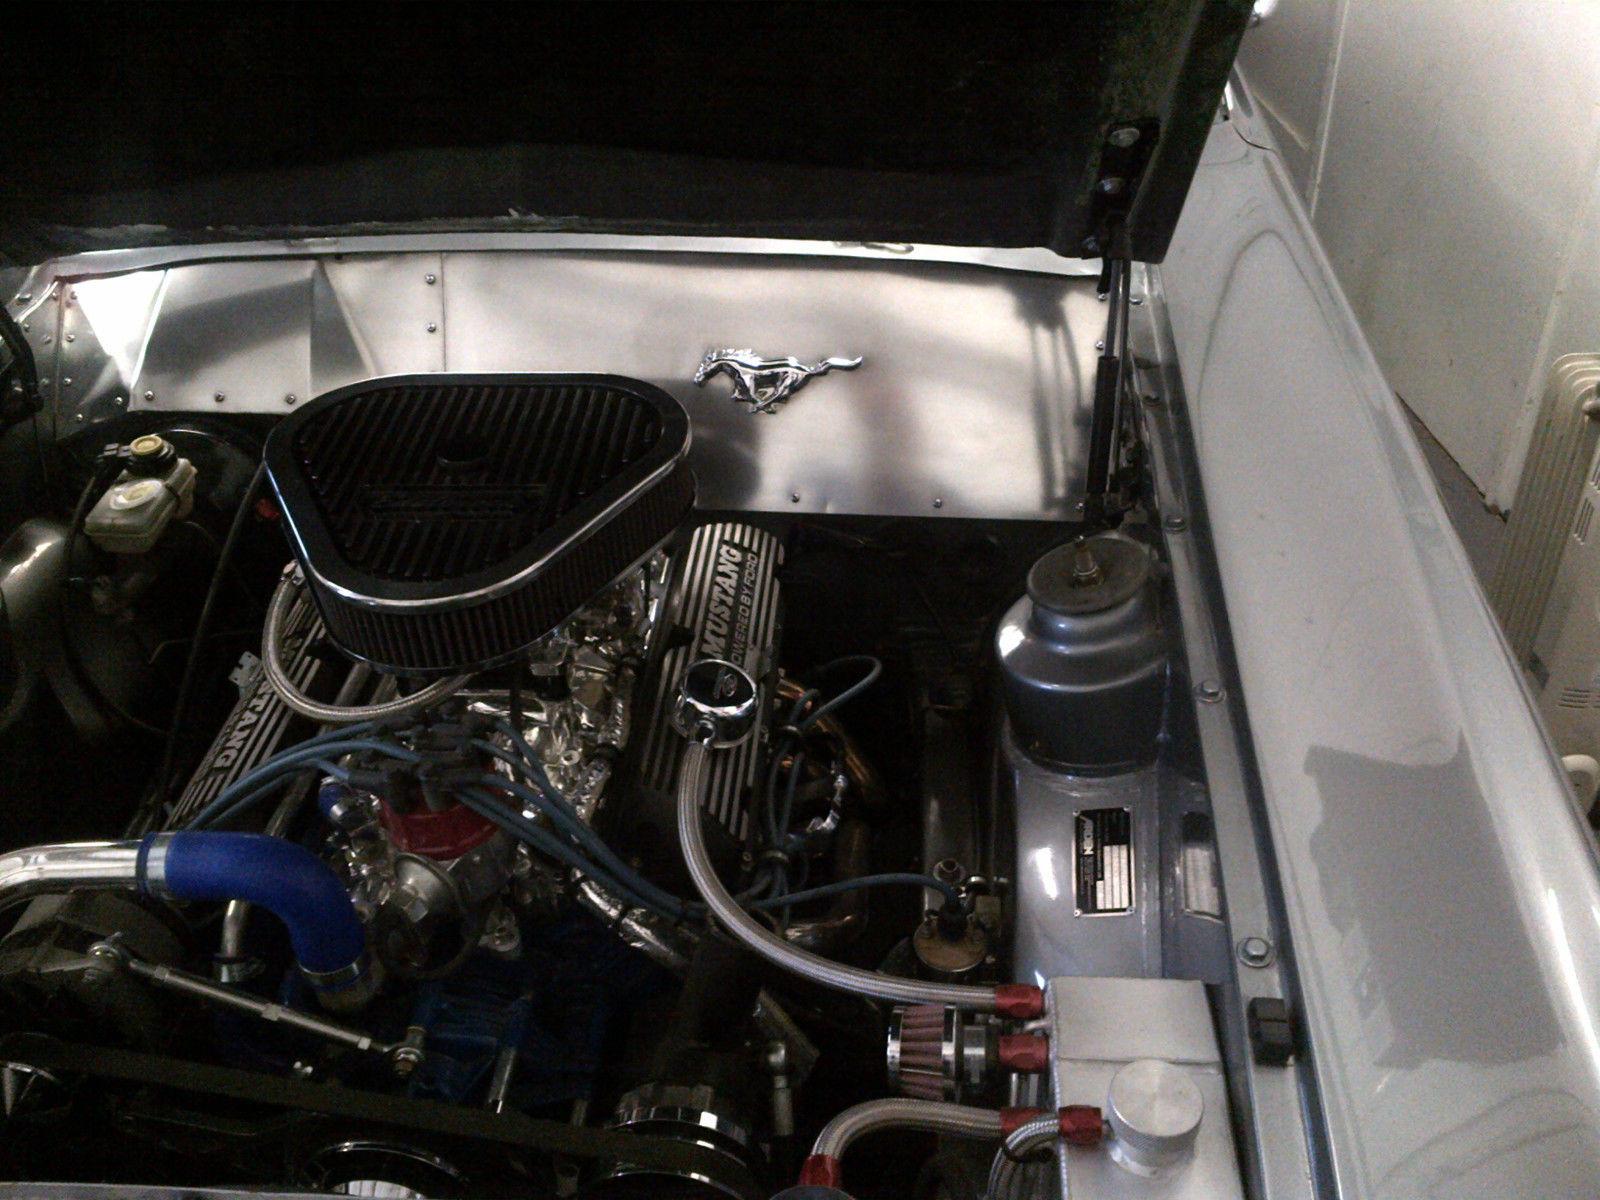 1967 eleanor replica based on ford sierra 05